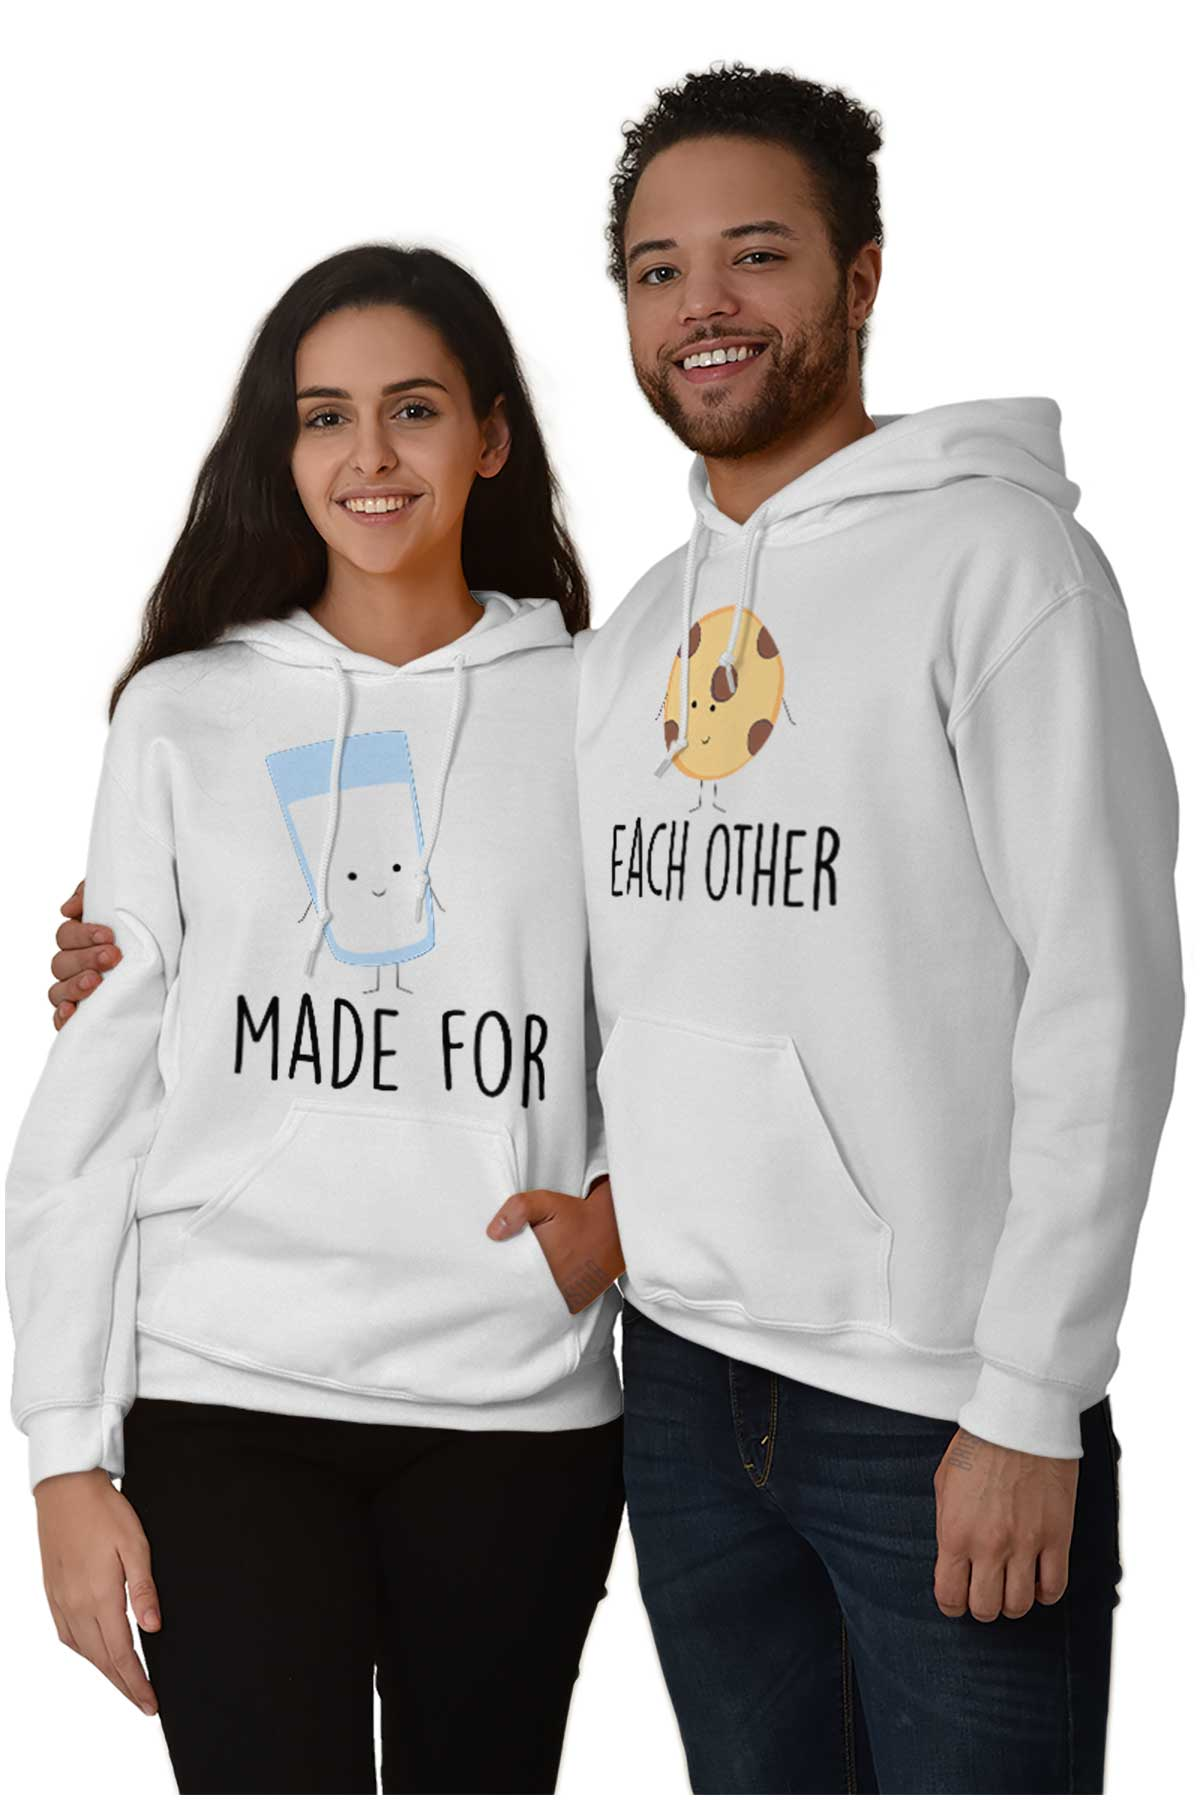 Matching Anime Hoodies : matching, anime, hoodies, Relationship, Boyfriend, Girlfriend, Matching, Hoodie, Hooded, Sweatshirt, Women